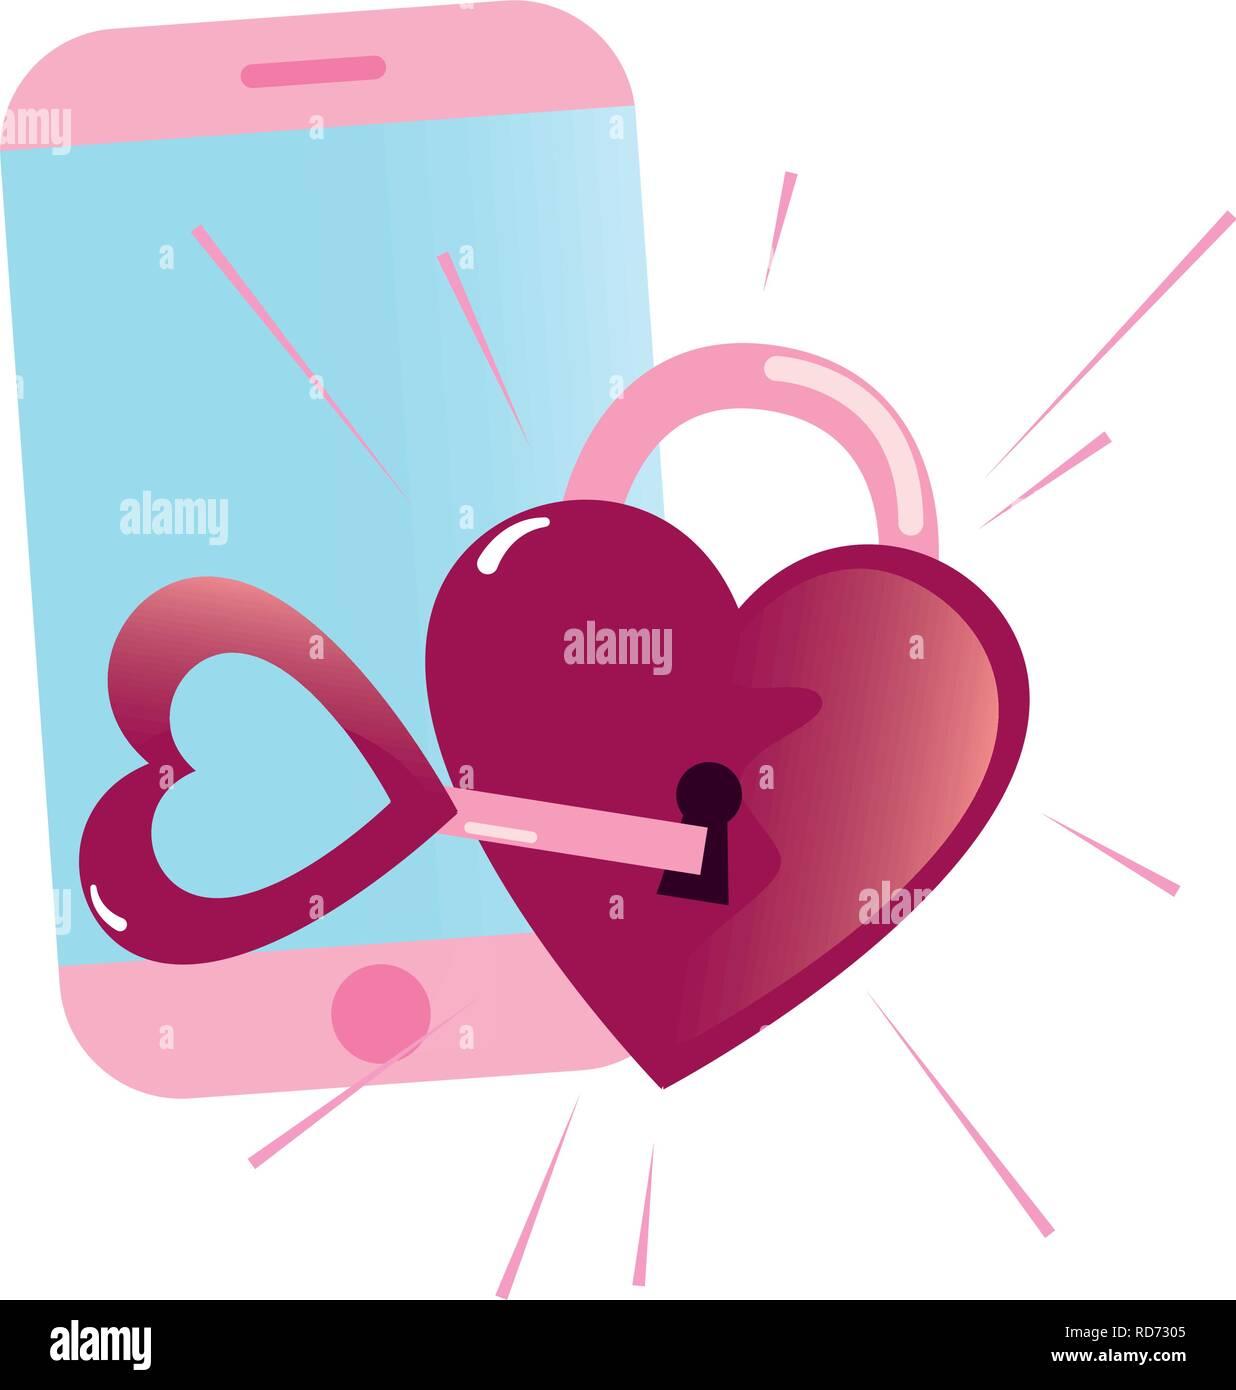 cellphone padlock love key happy valentines day vector illustration - Stock Image